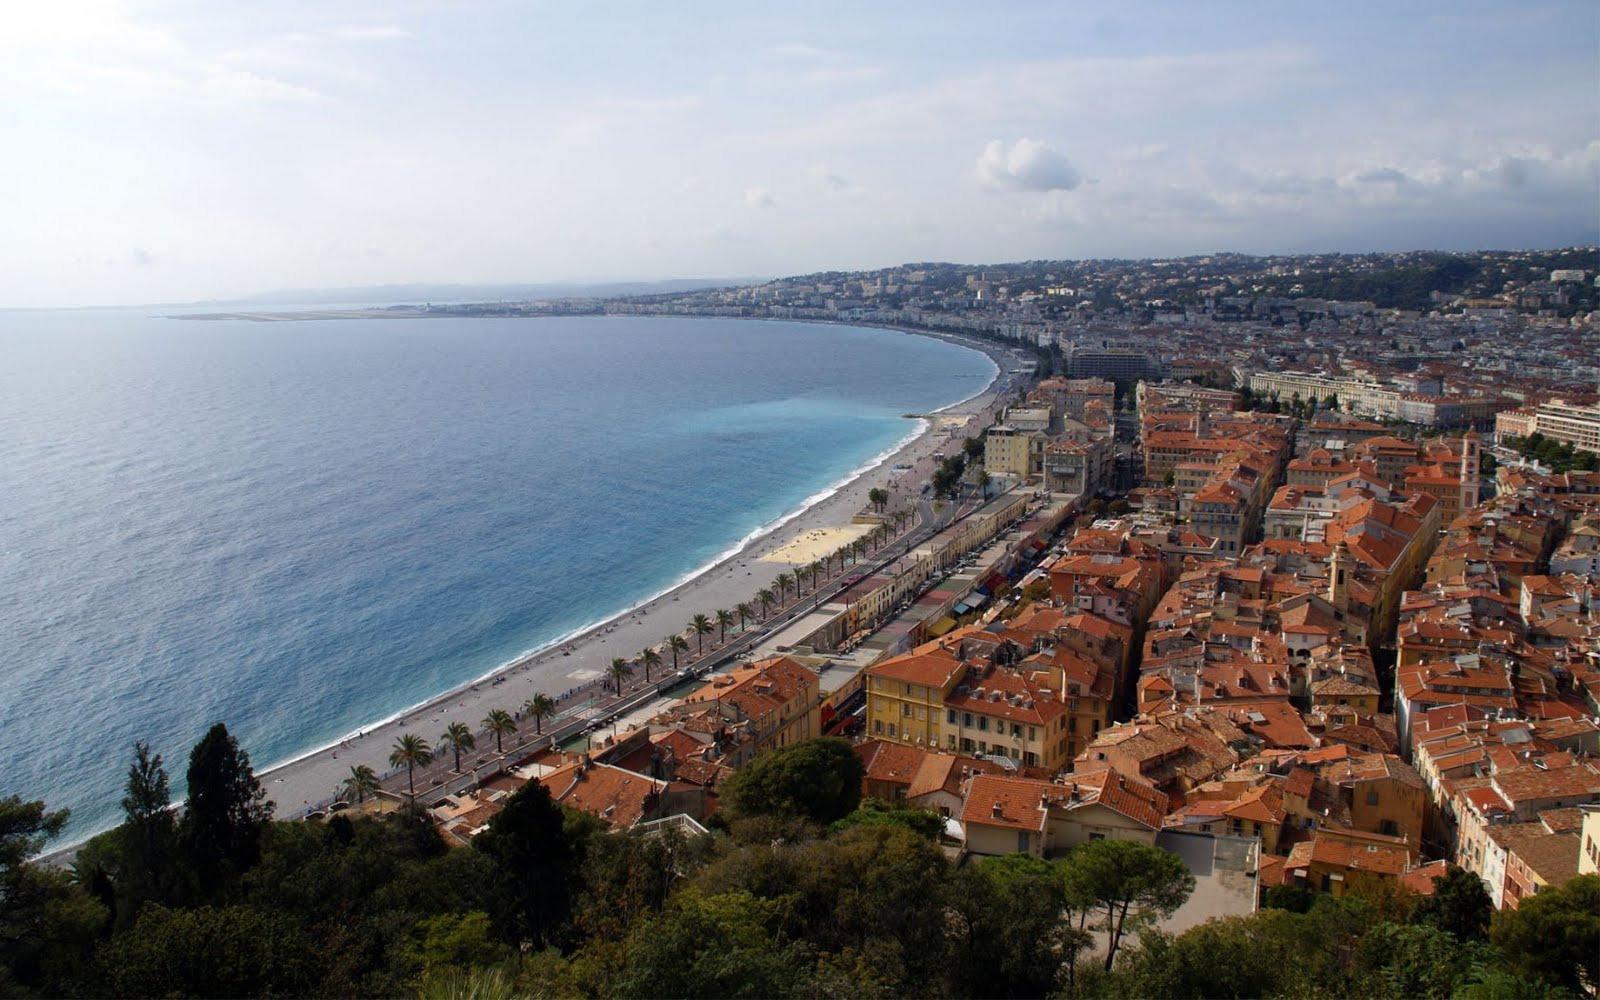 Nice - Cote d'Azur,South of France | Hd Desktop Wallpaper